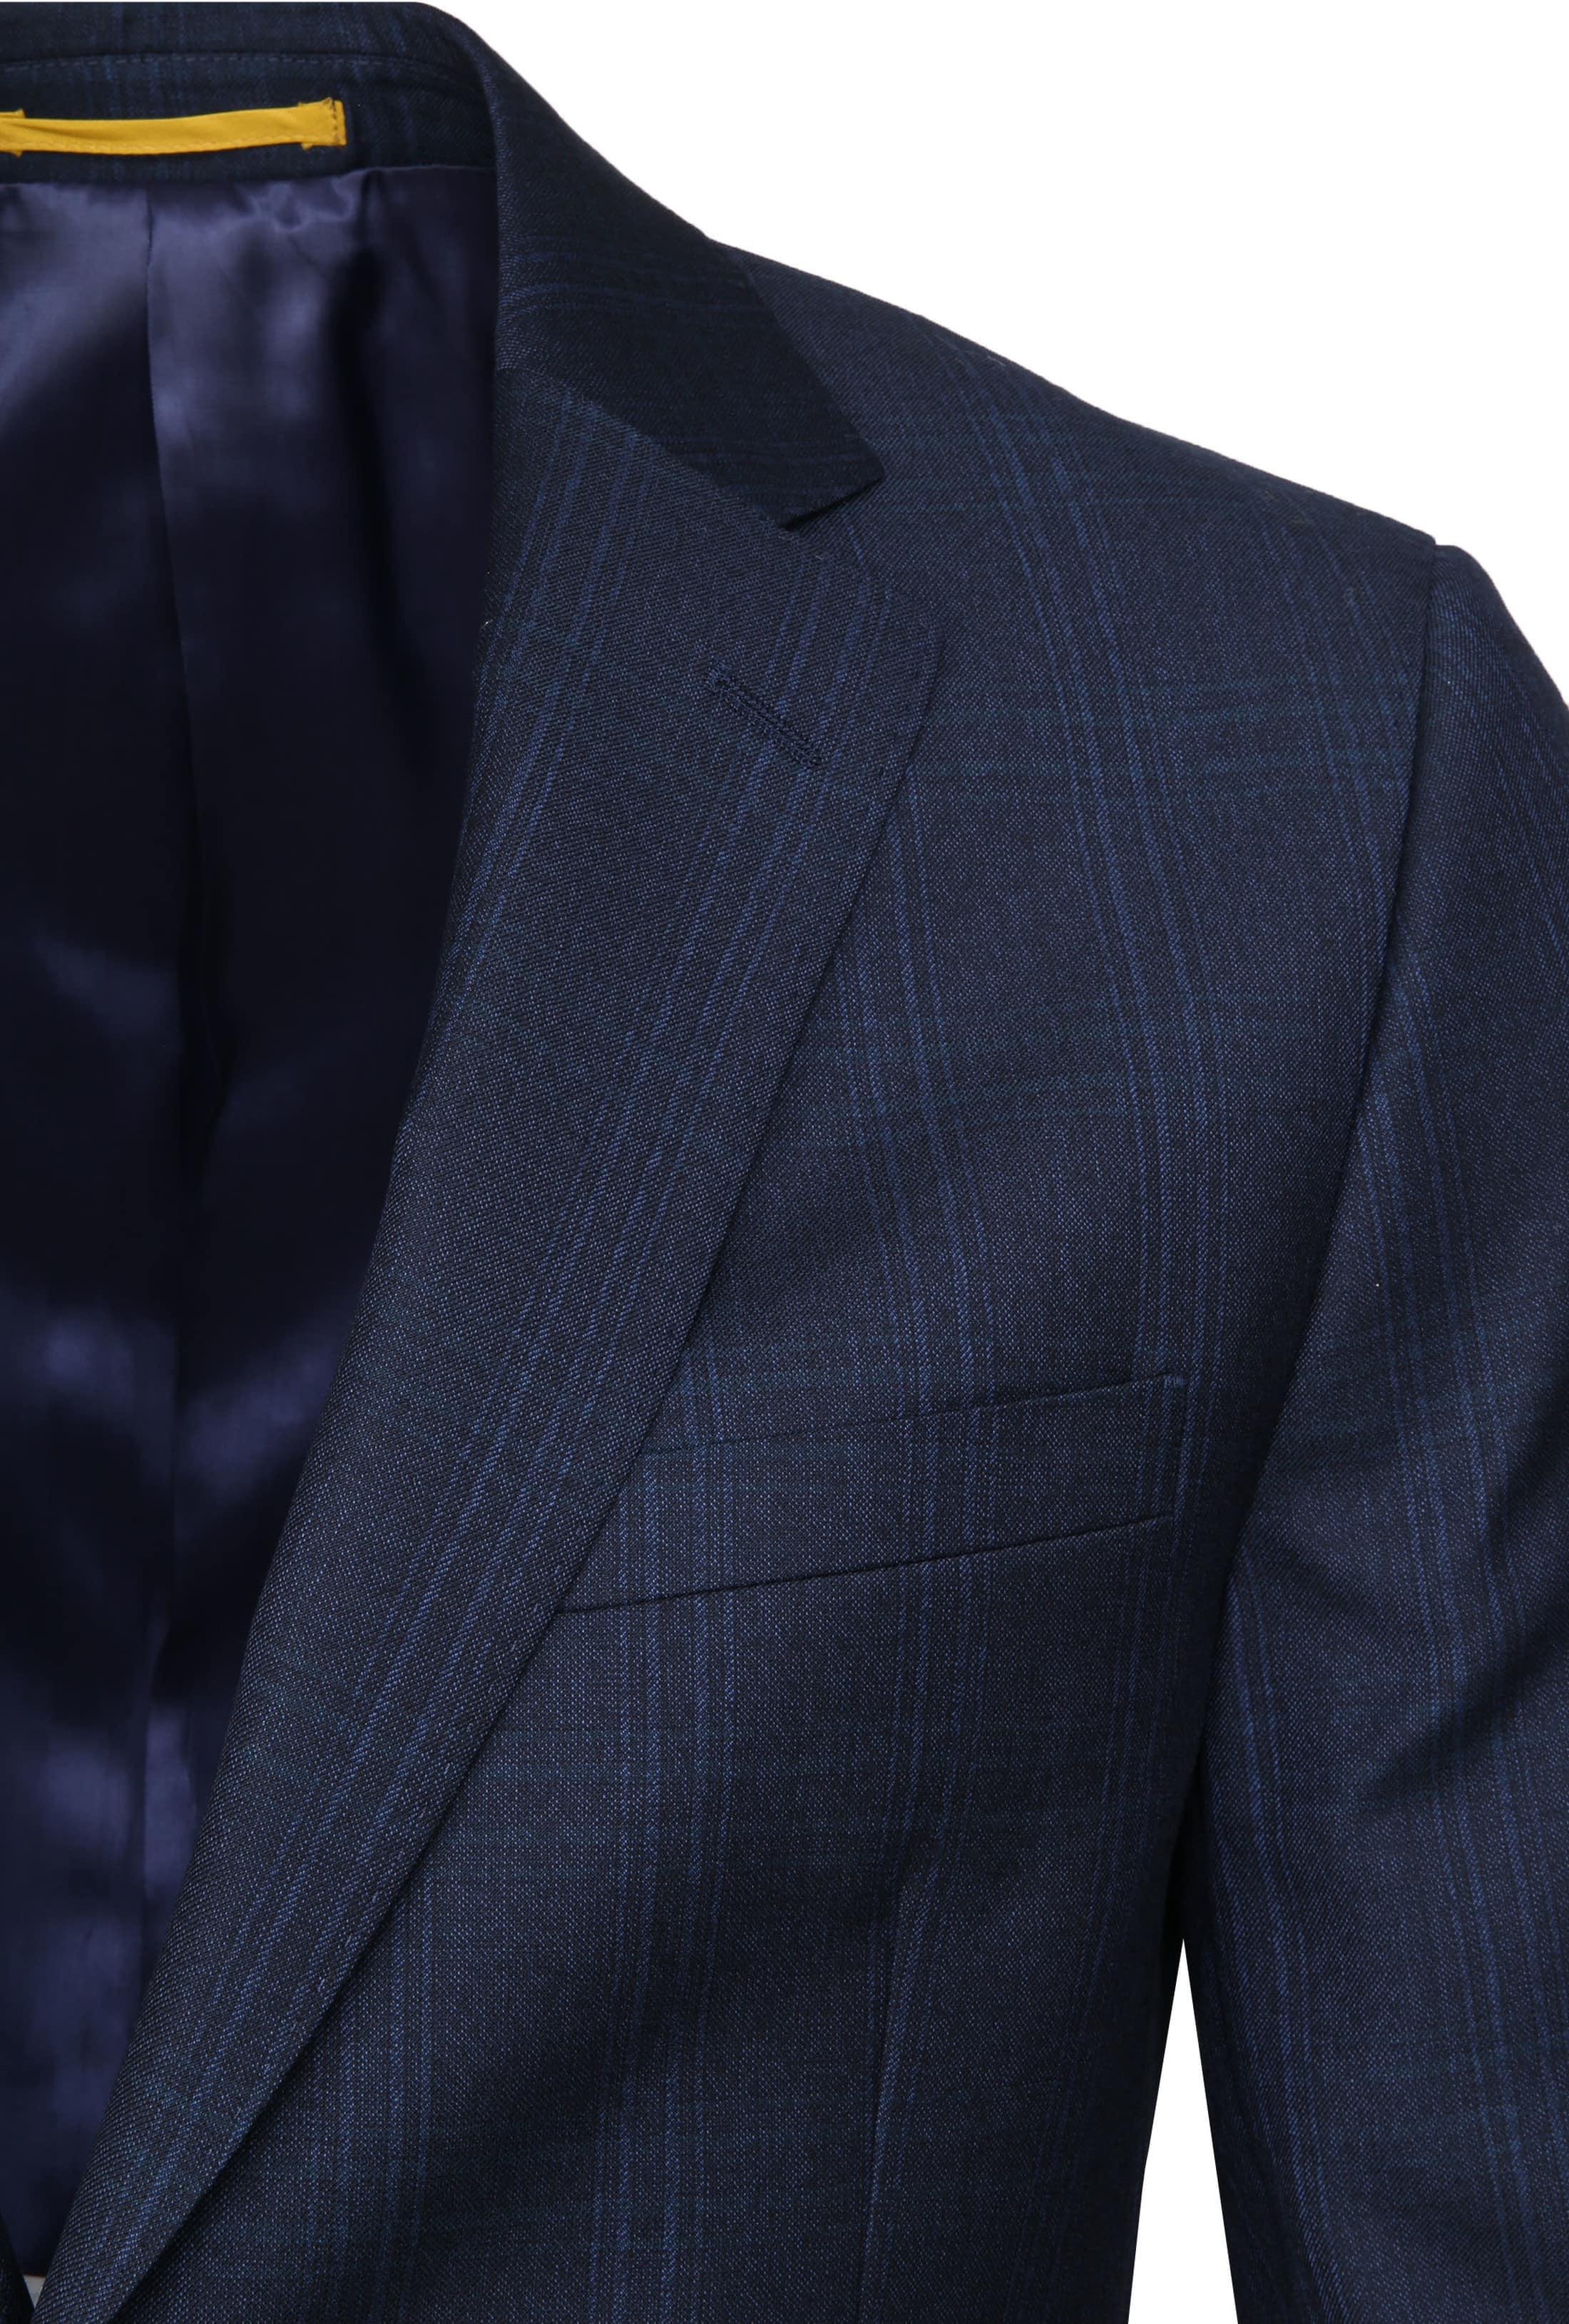 Suitable Strato Anzug Dunkelblau Fenster foto 3